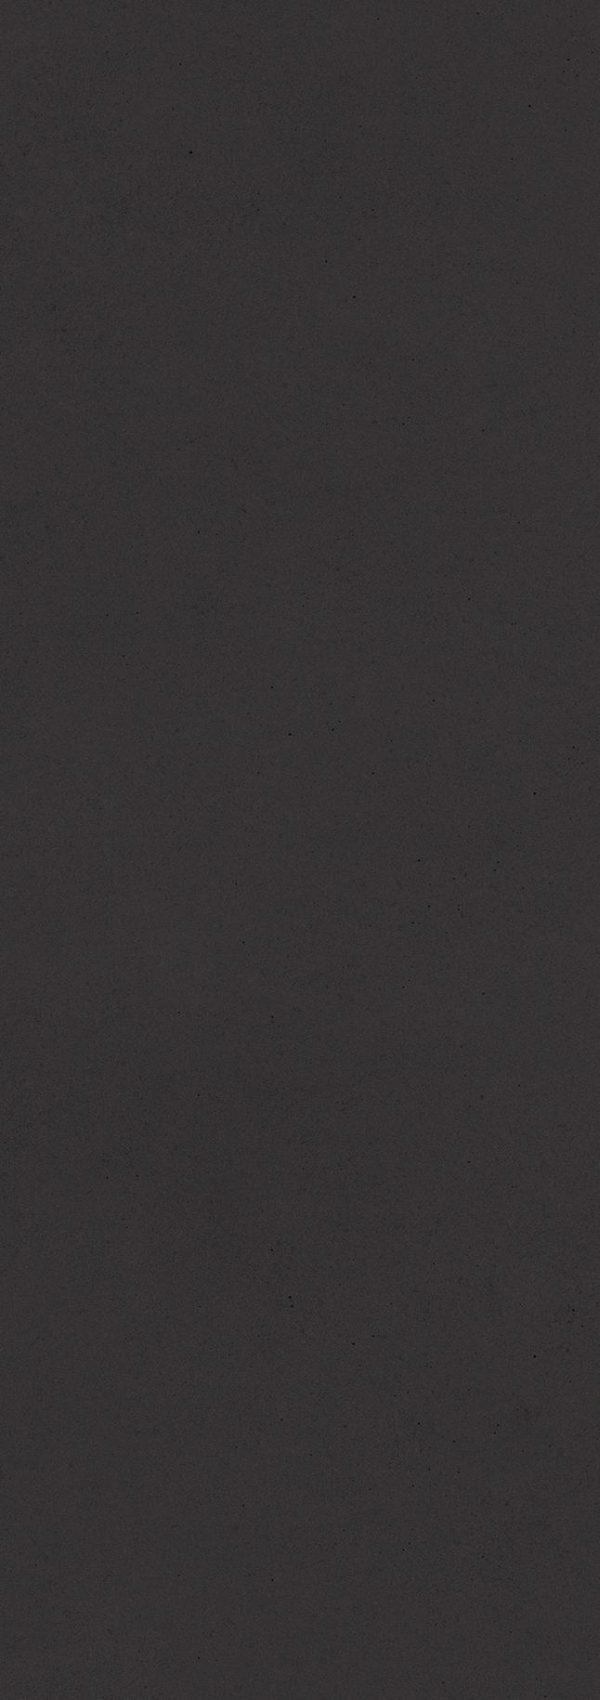 Cava - Black